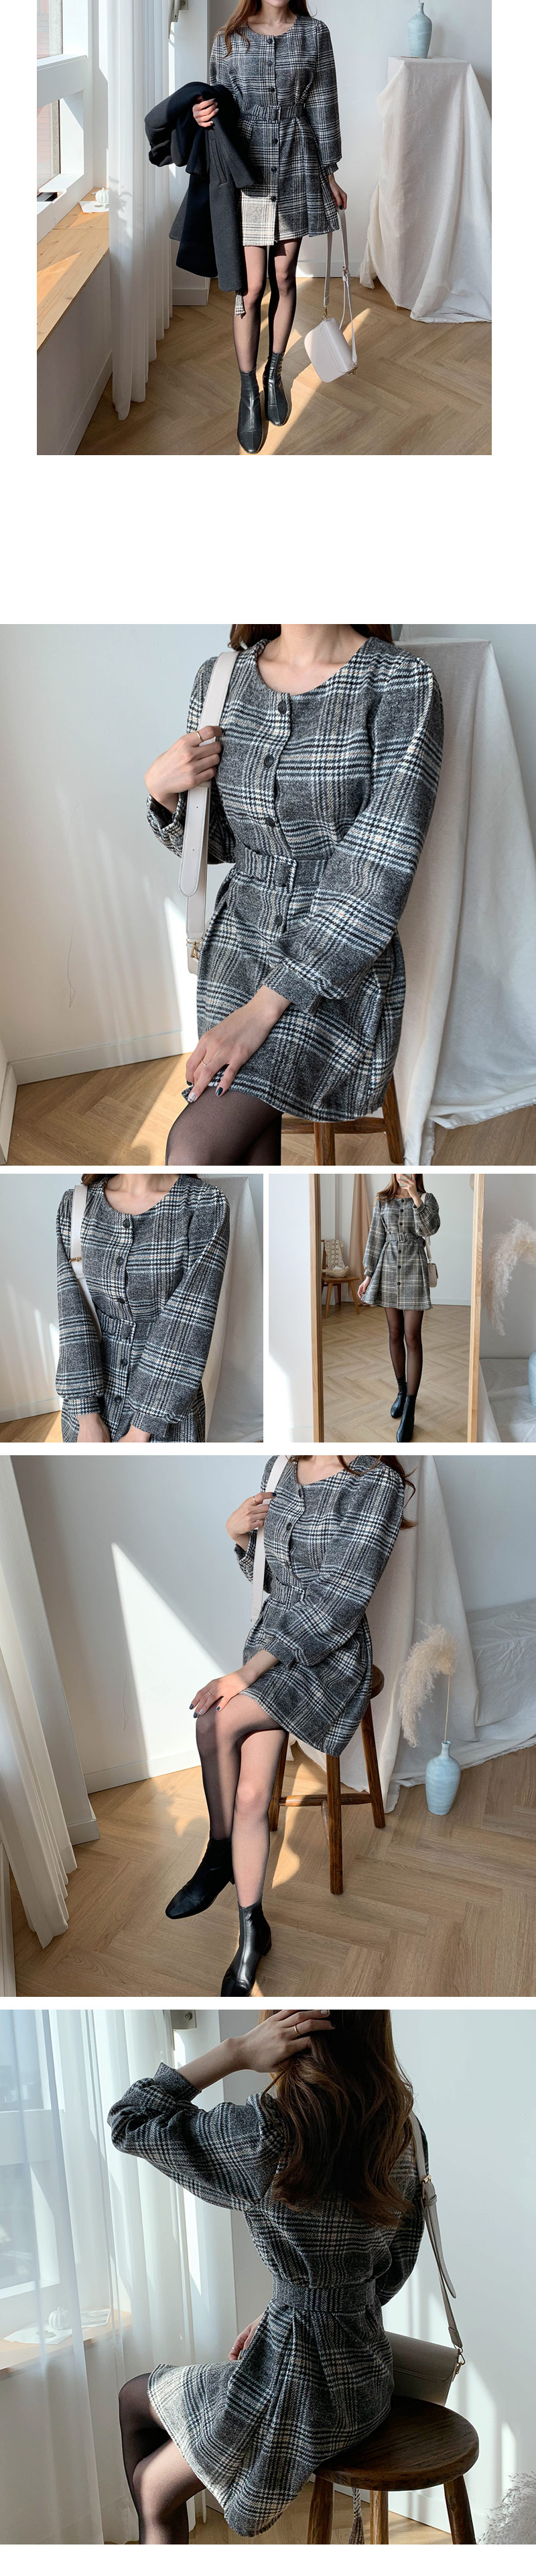 The Enry Check Pin Tuck Belt Dress